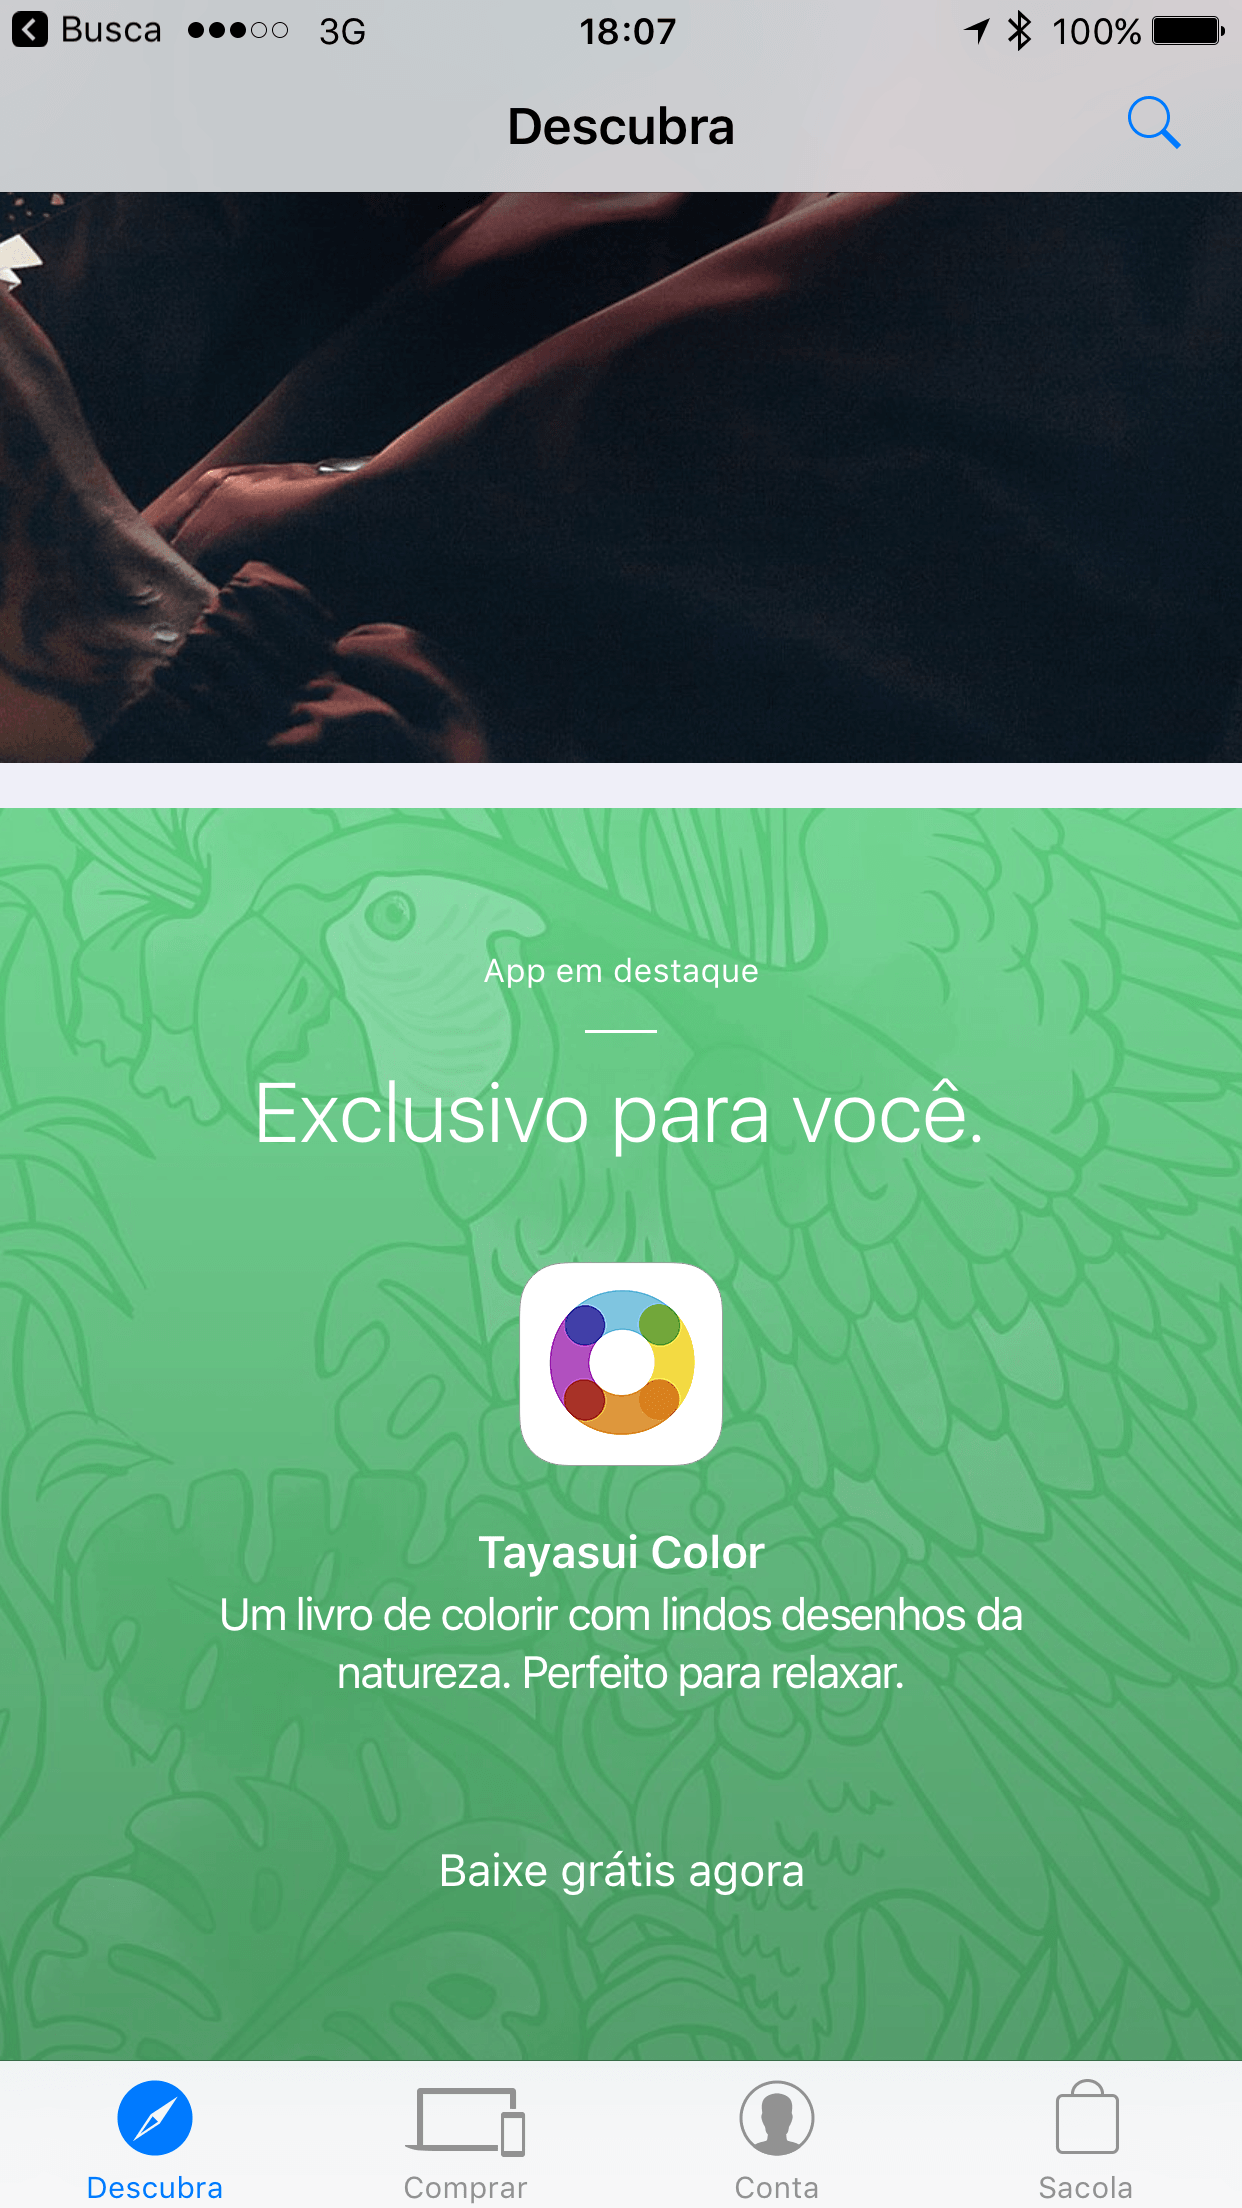 Tayasui Color no Apple Store